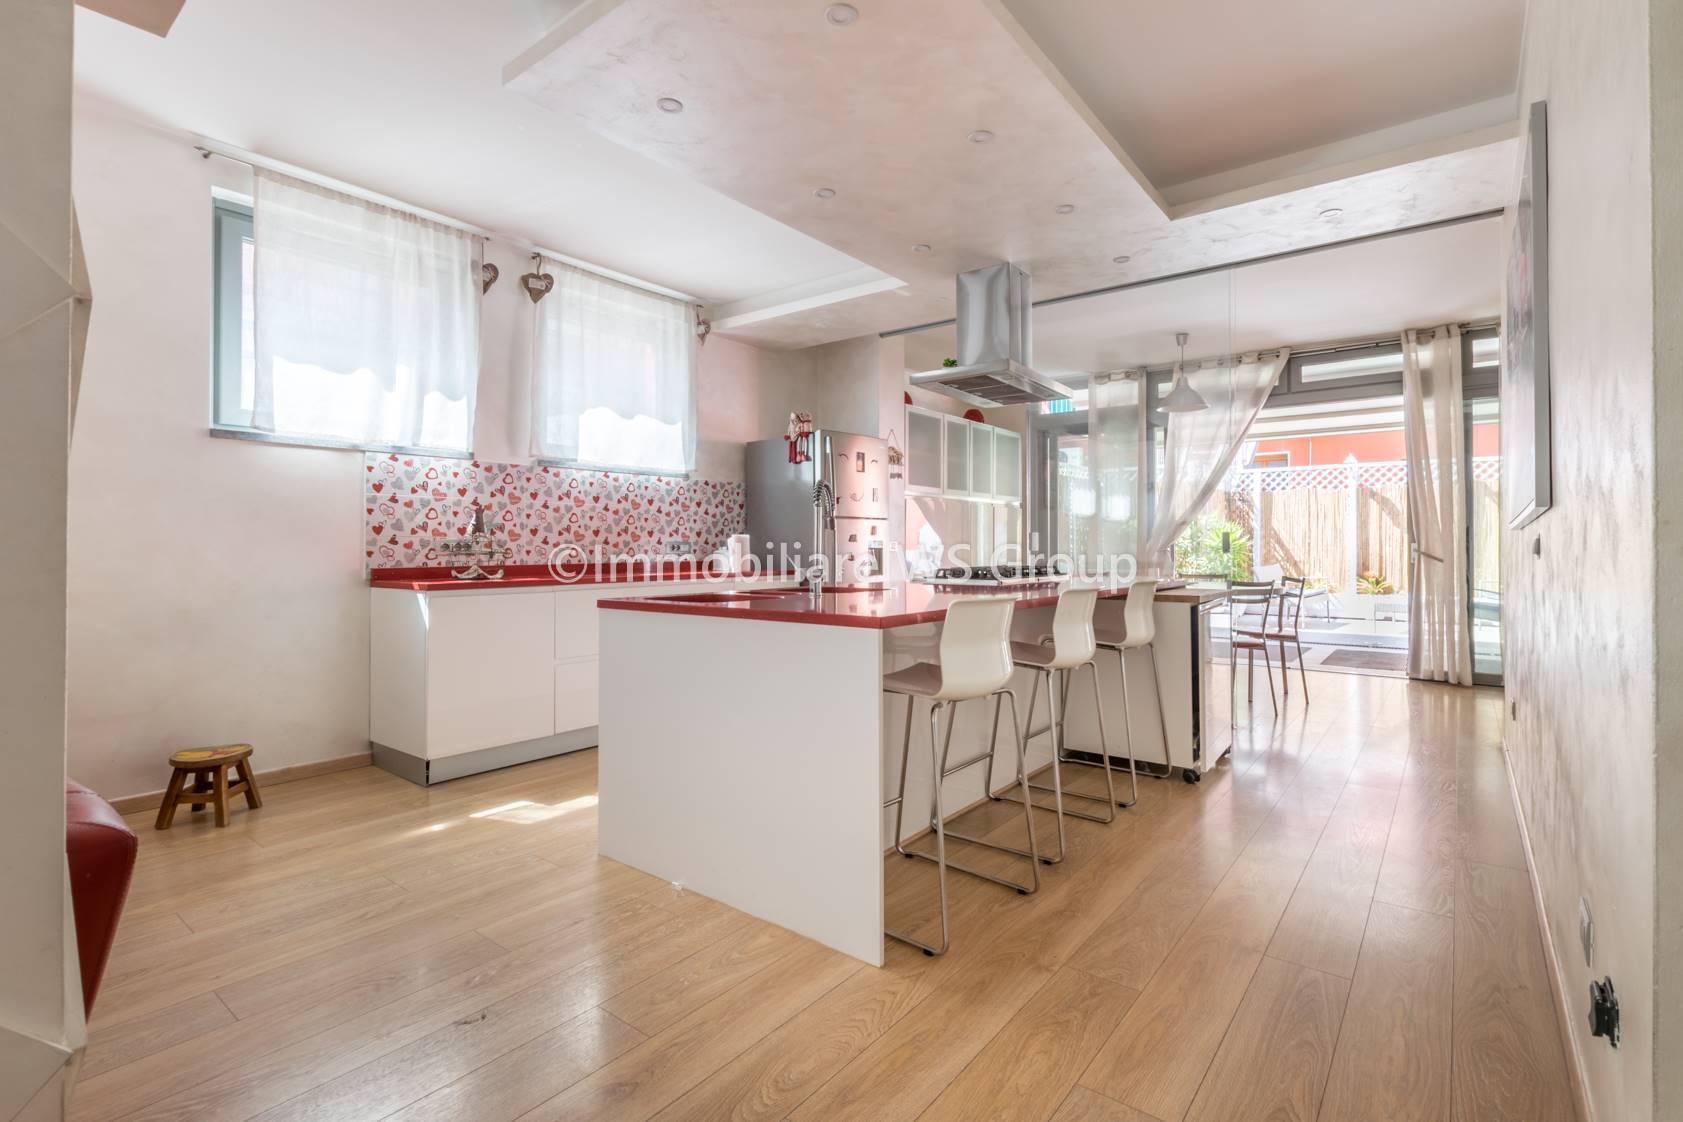 Casa indipendente in Vendita a Lissone: 5 locali, 235 mq